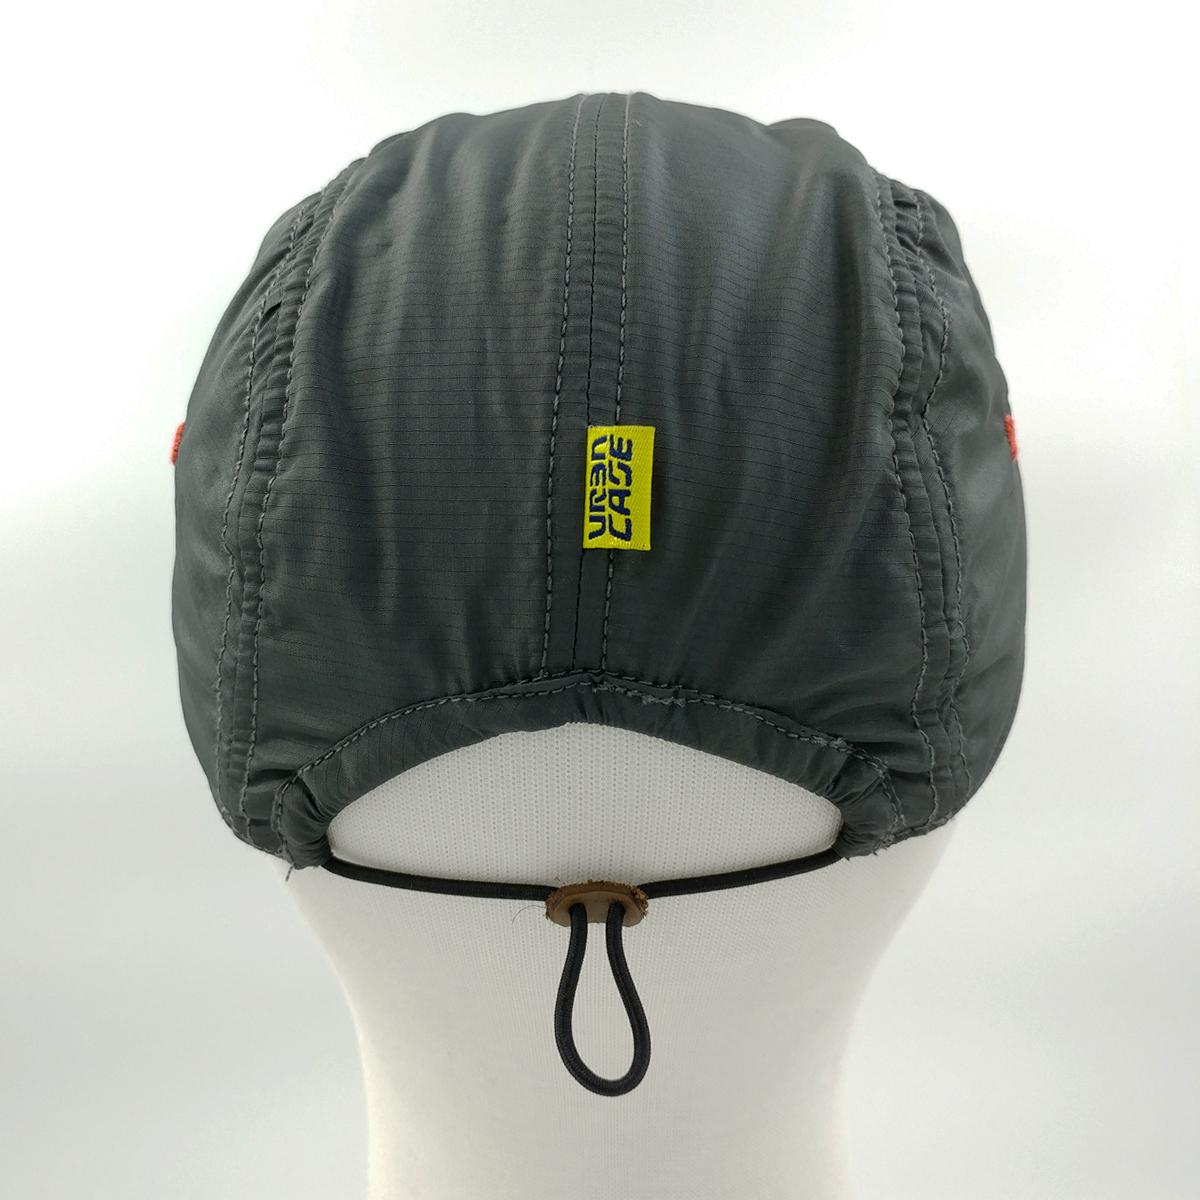 cycling cap - greygraven3